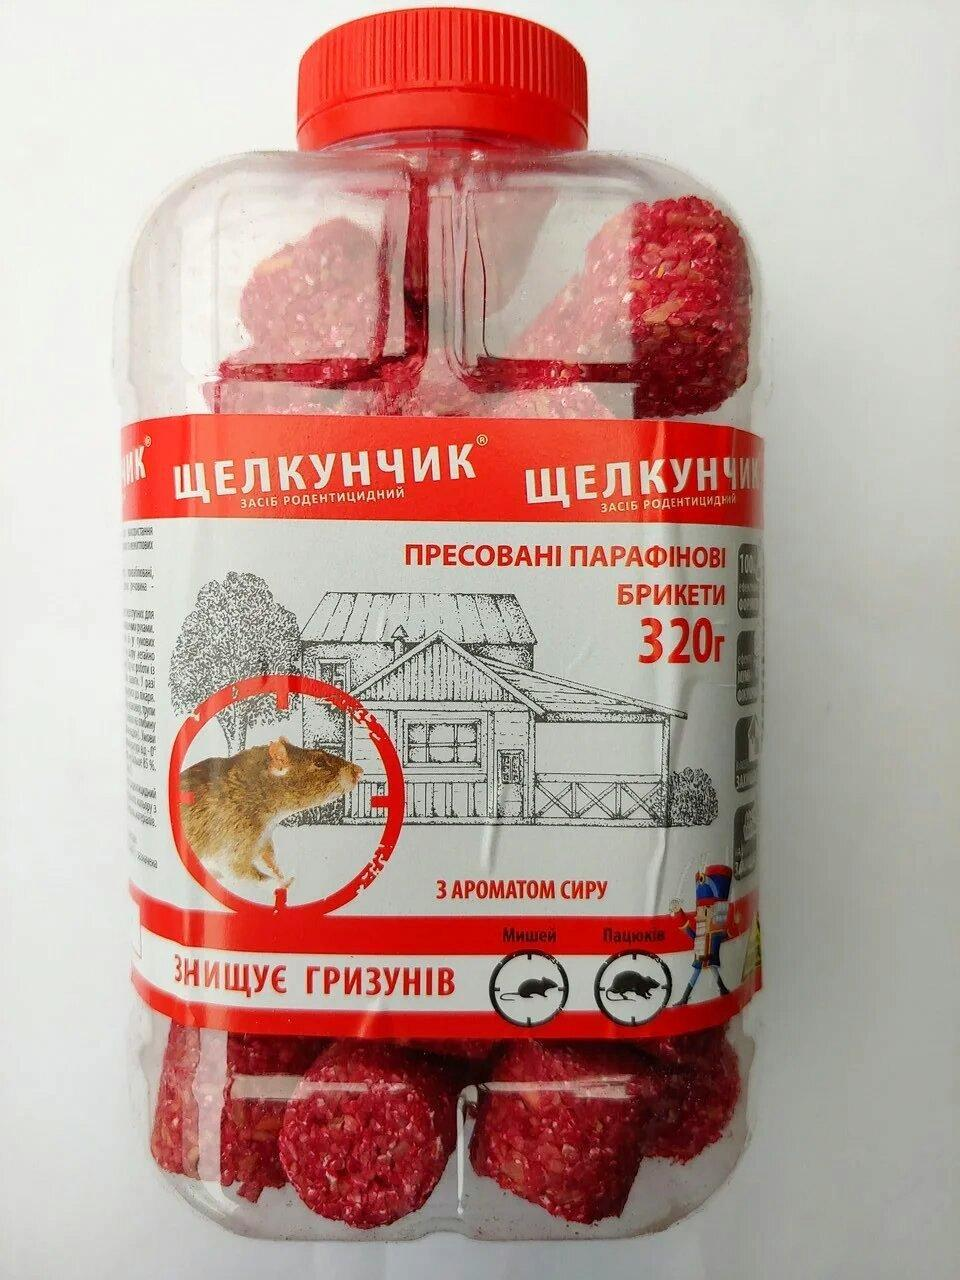 Родентицид Щелкунчик брикеты 6 кг